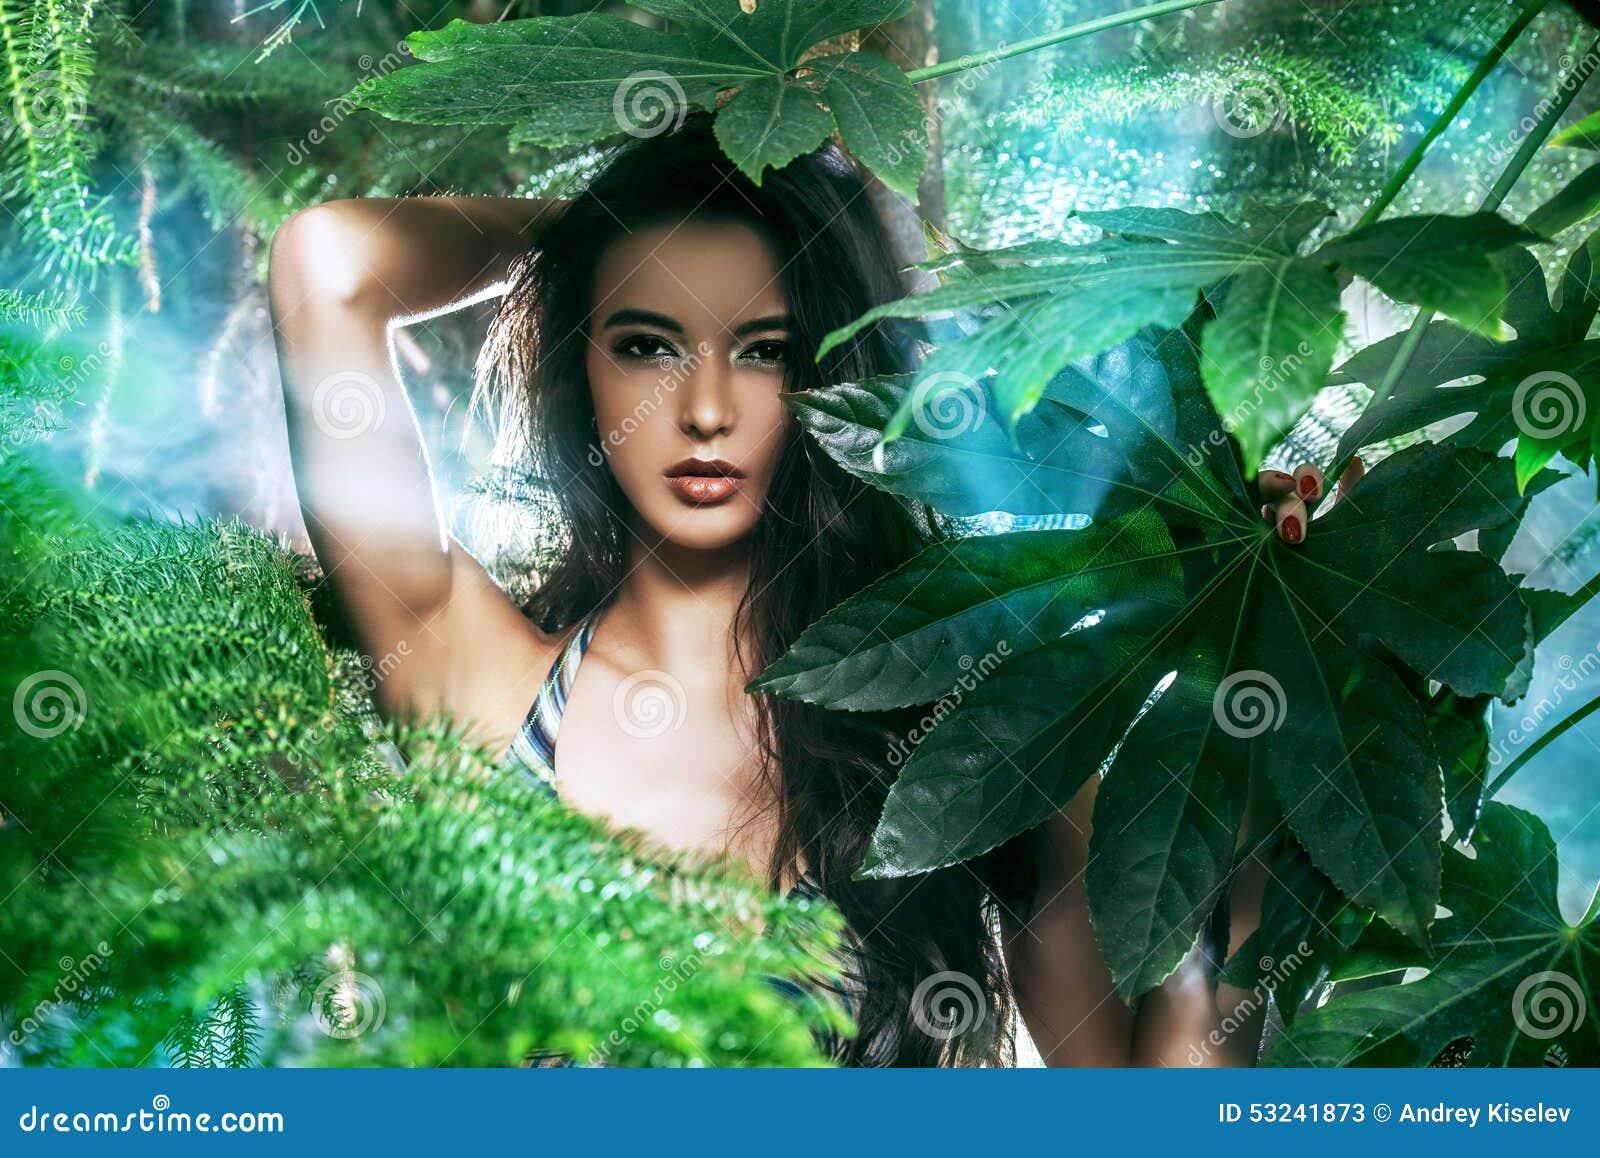 Тропические фото с девушками